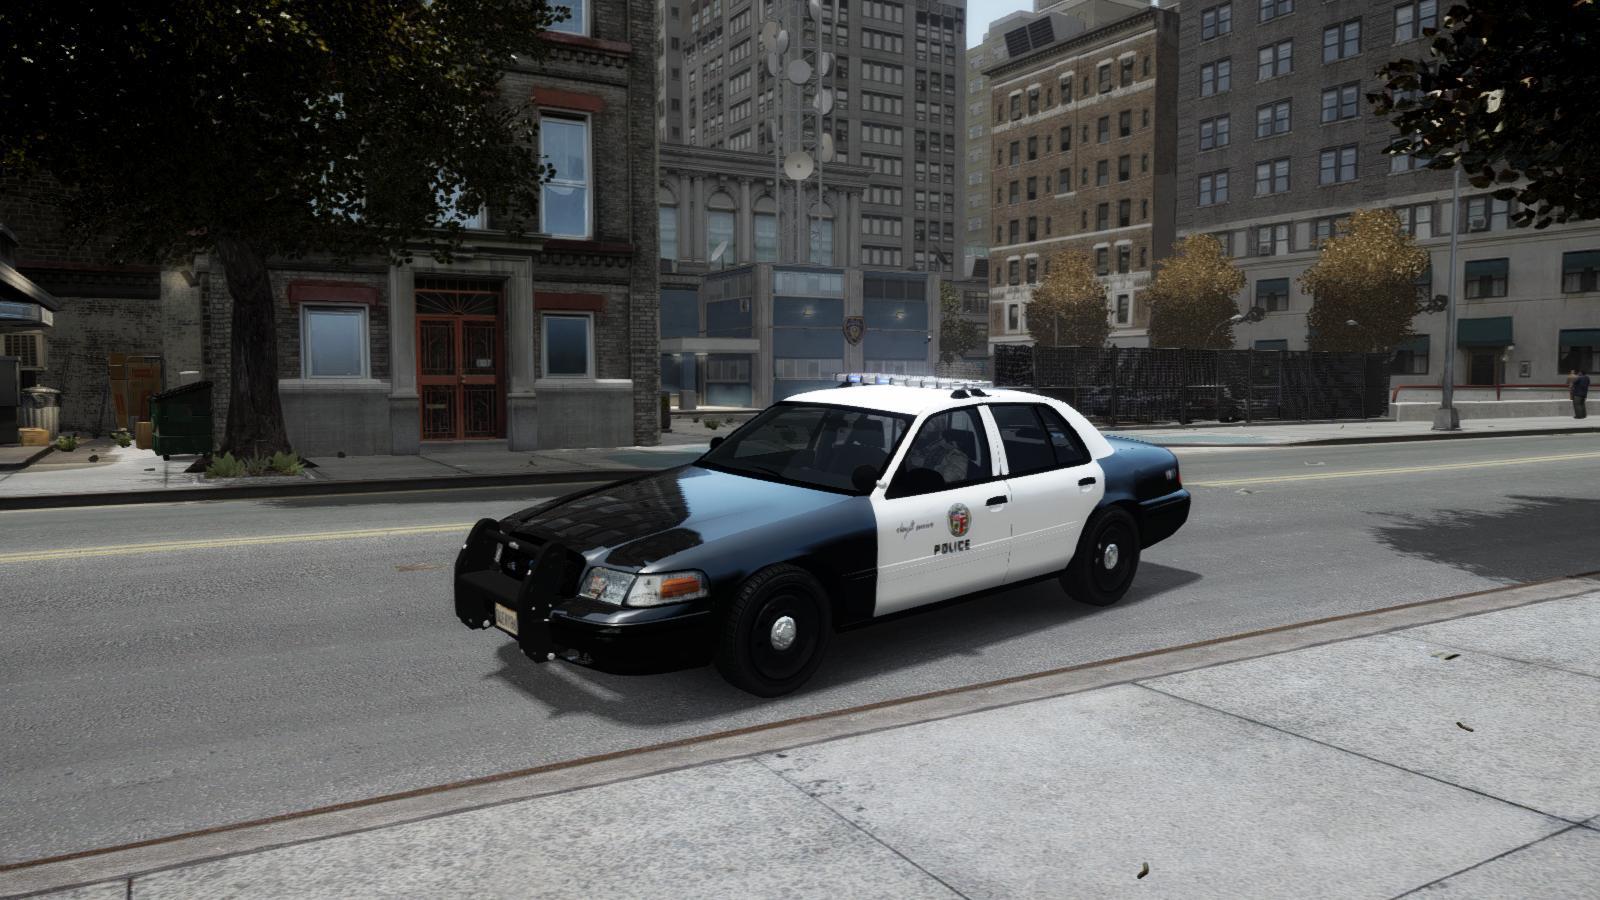 GTA Police Wallpapers - Wallpaper Cave